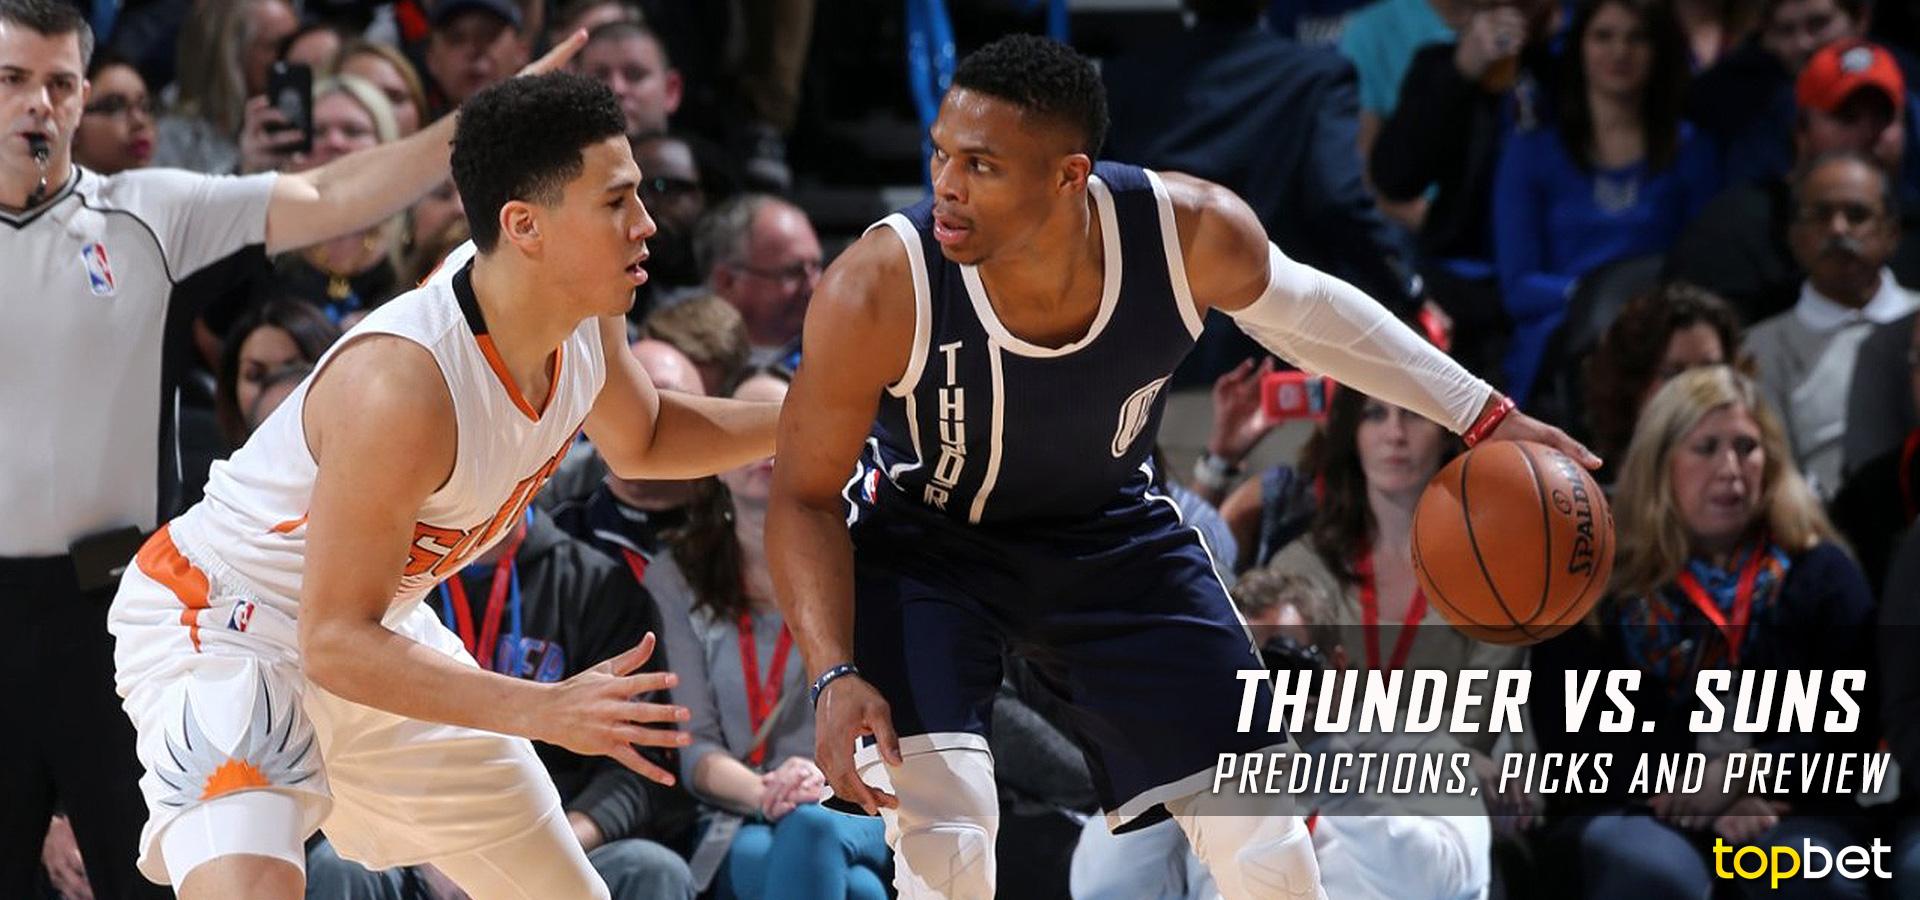 Thunder vs Suns Predictions, Picks & Preview – April 2017